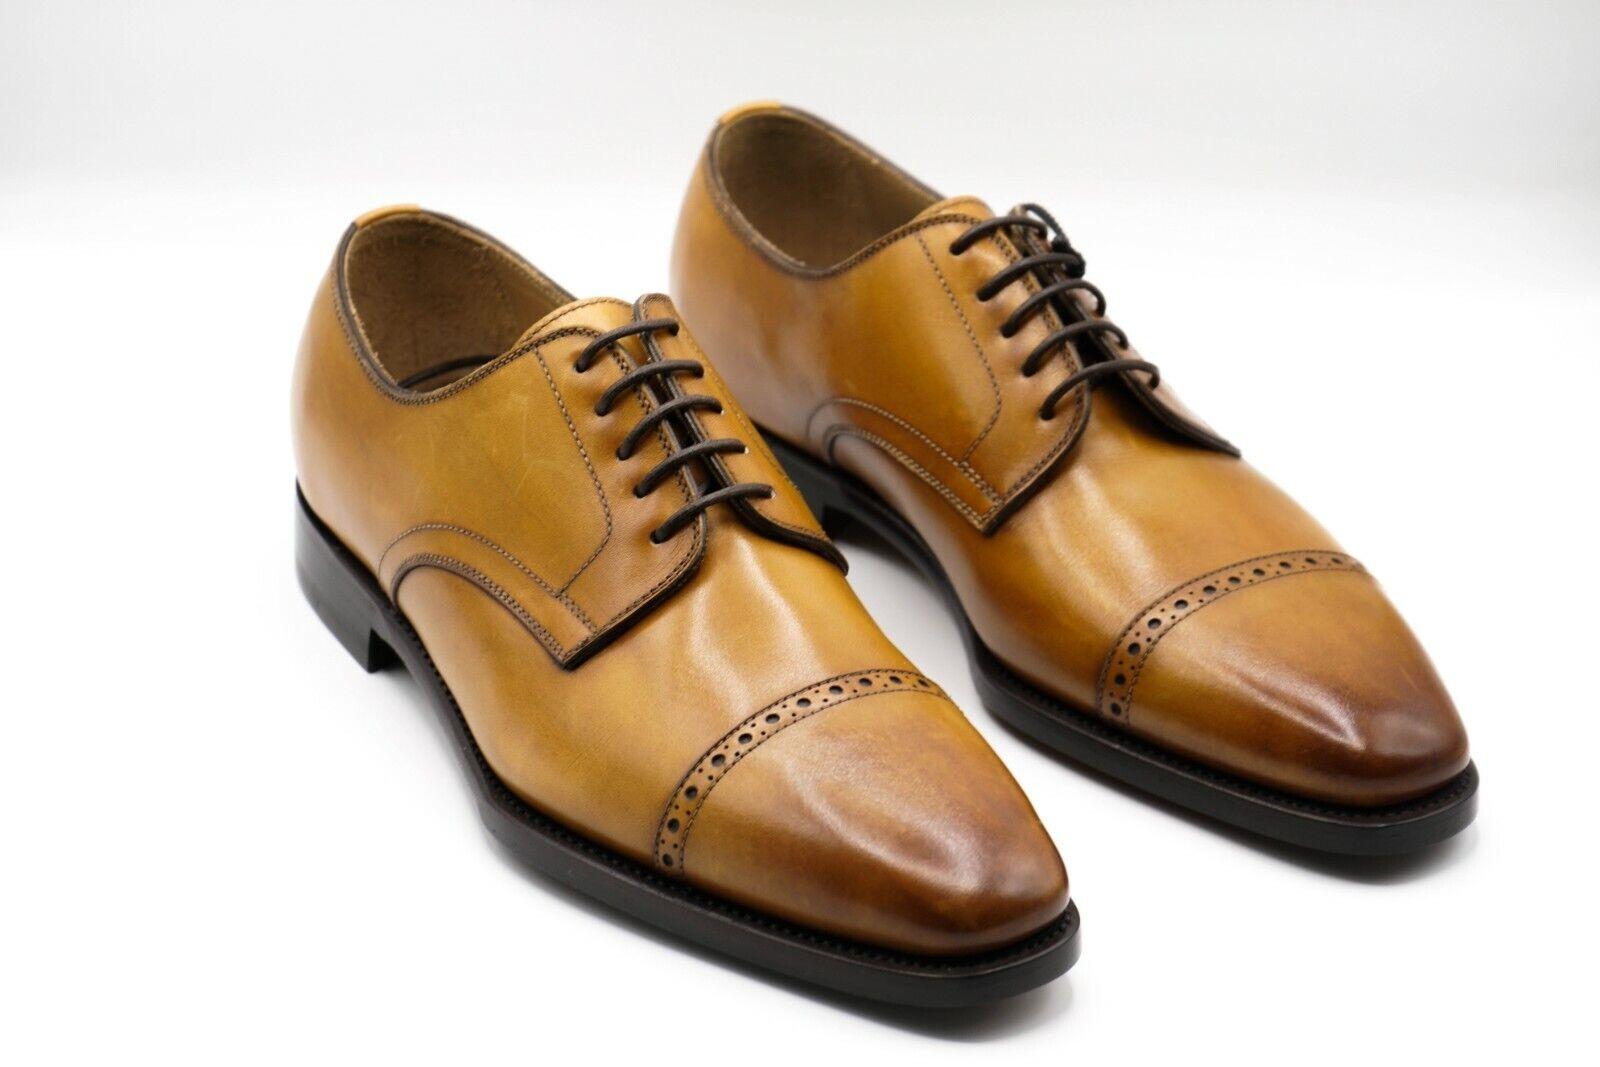 NEW KITON Napoli Dress Leather Shoes Size Eu 40 Uk 6 Us 7 (KIS13)